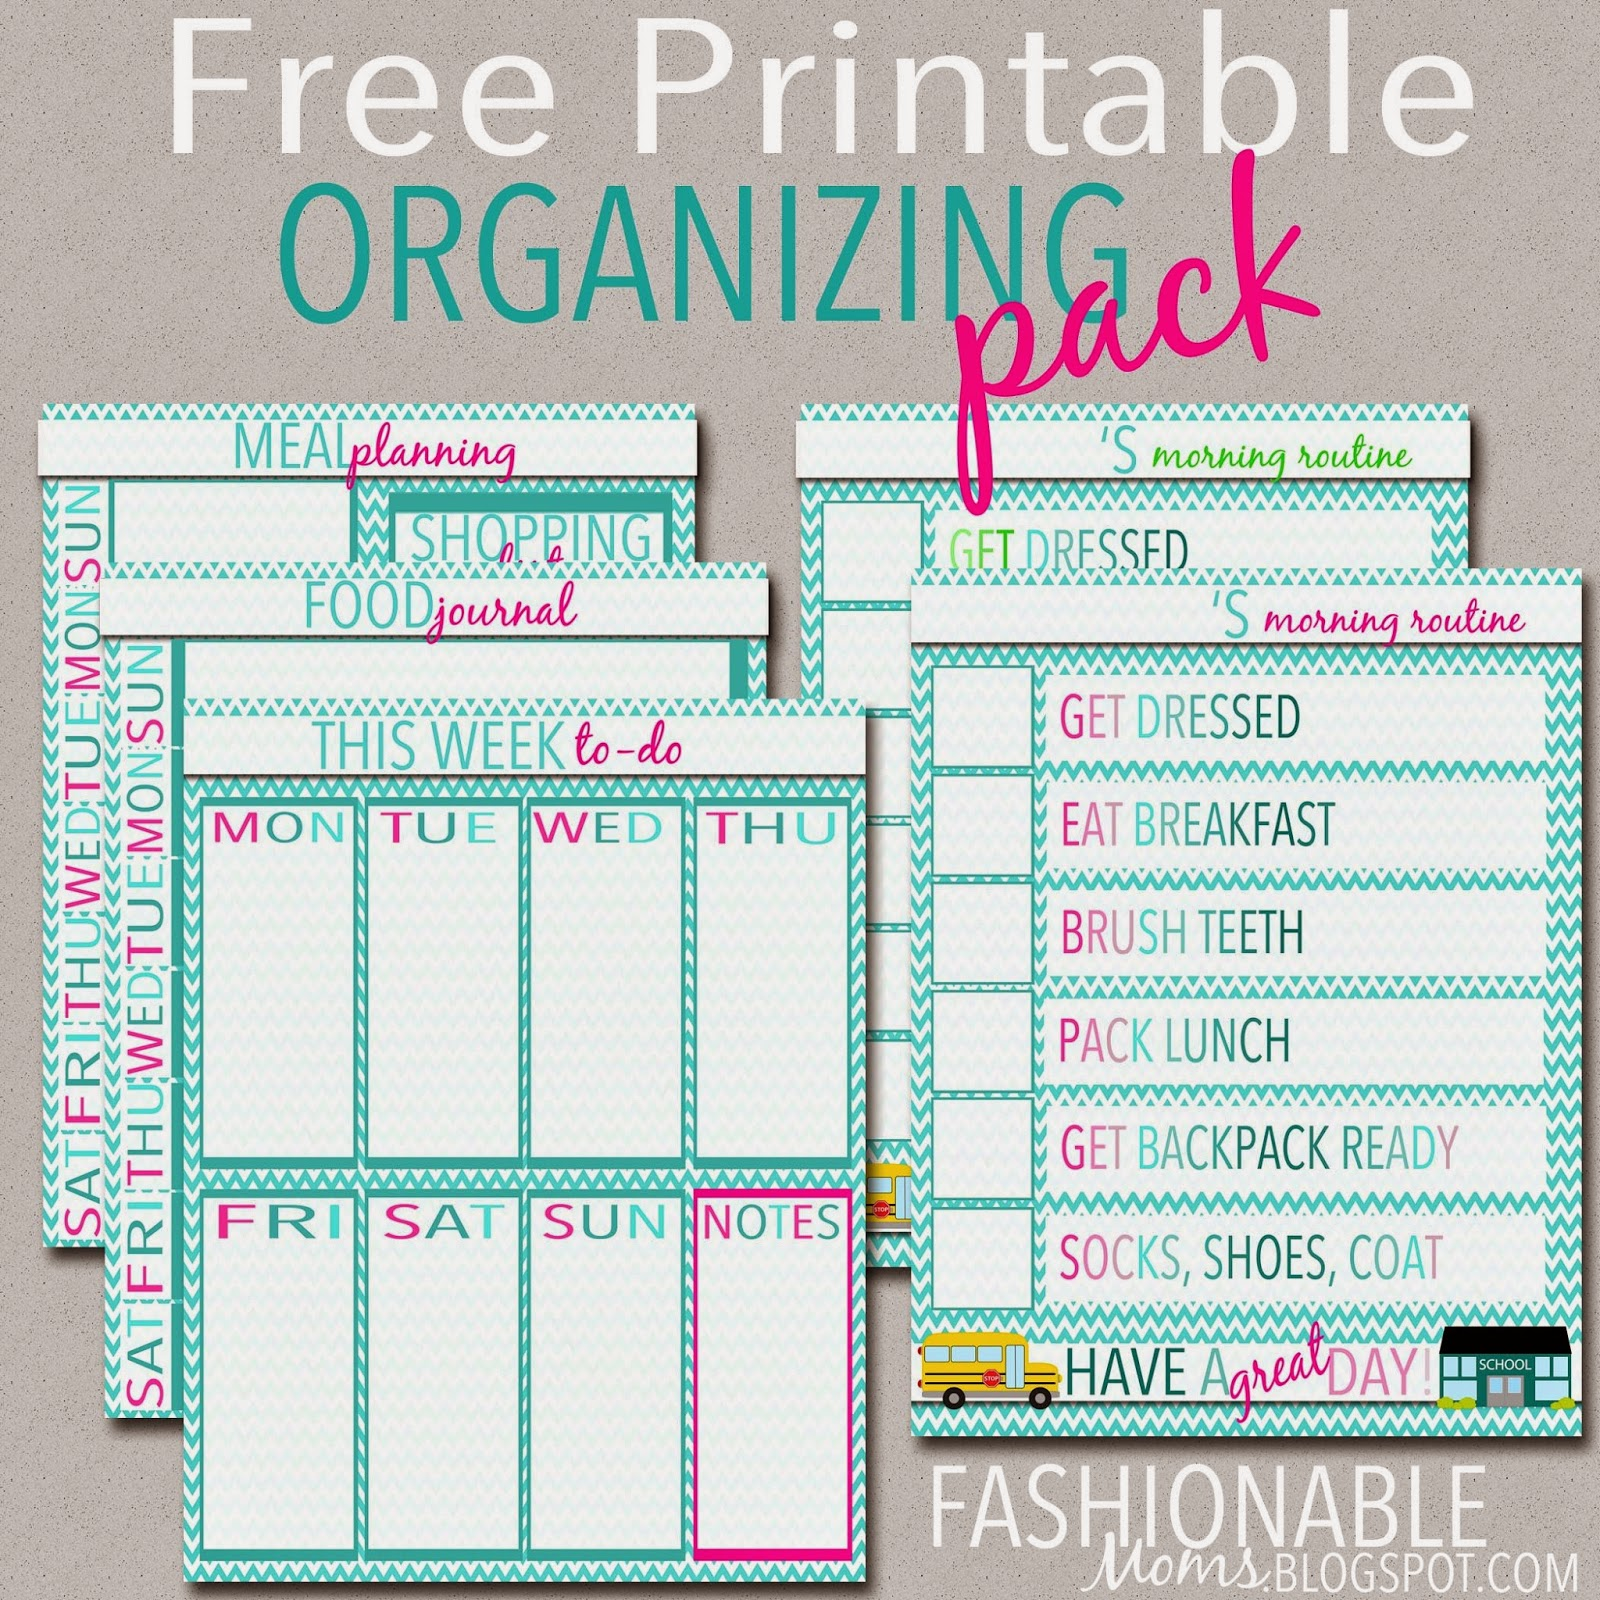 My Fashionable Designs: Free Printable Organizing Pack